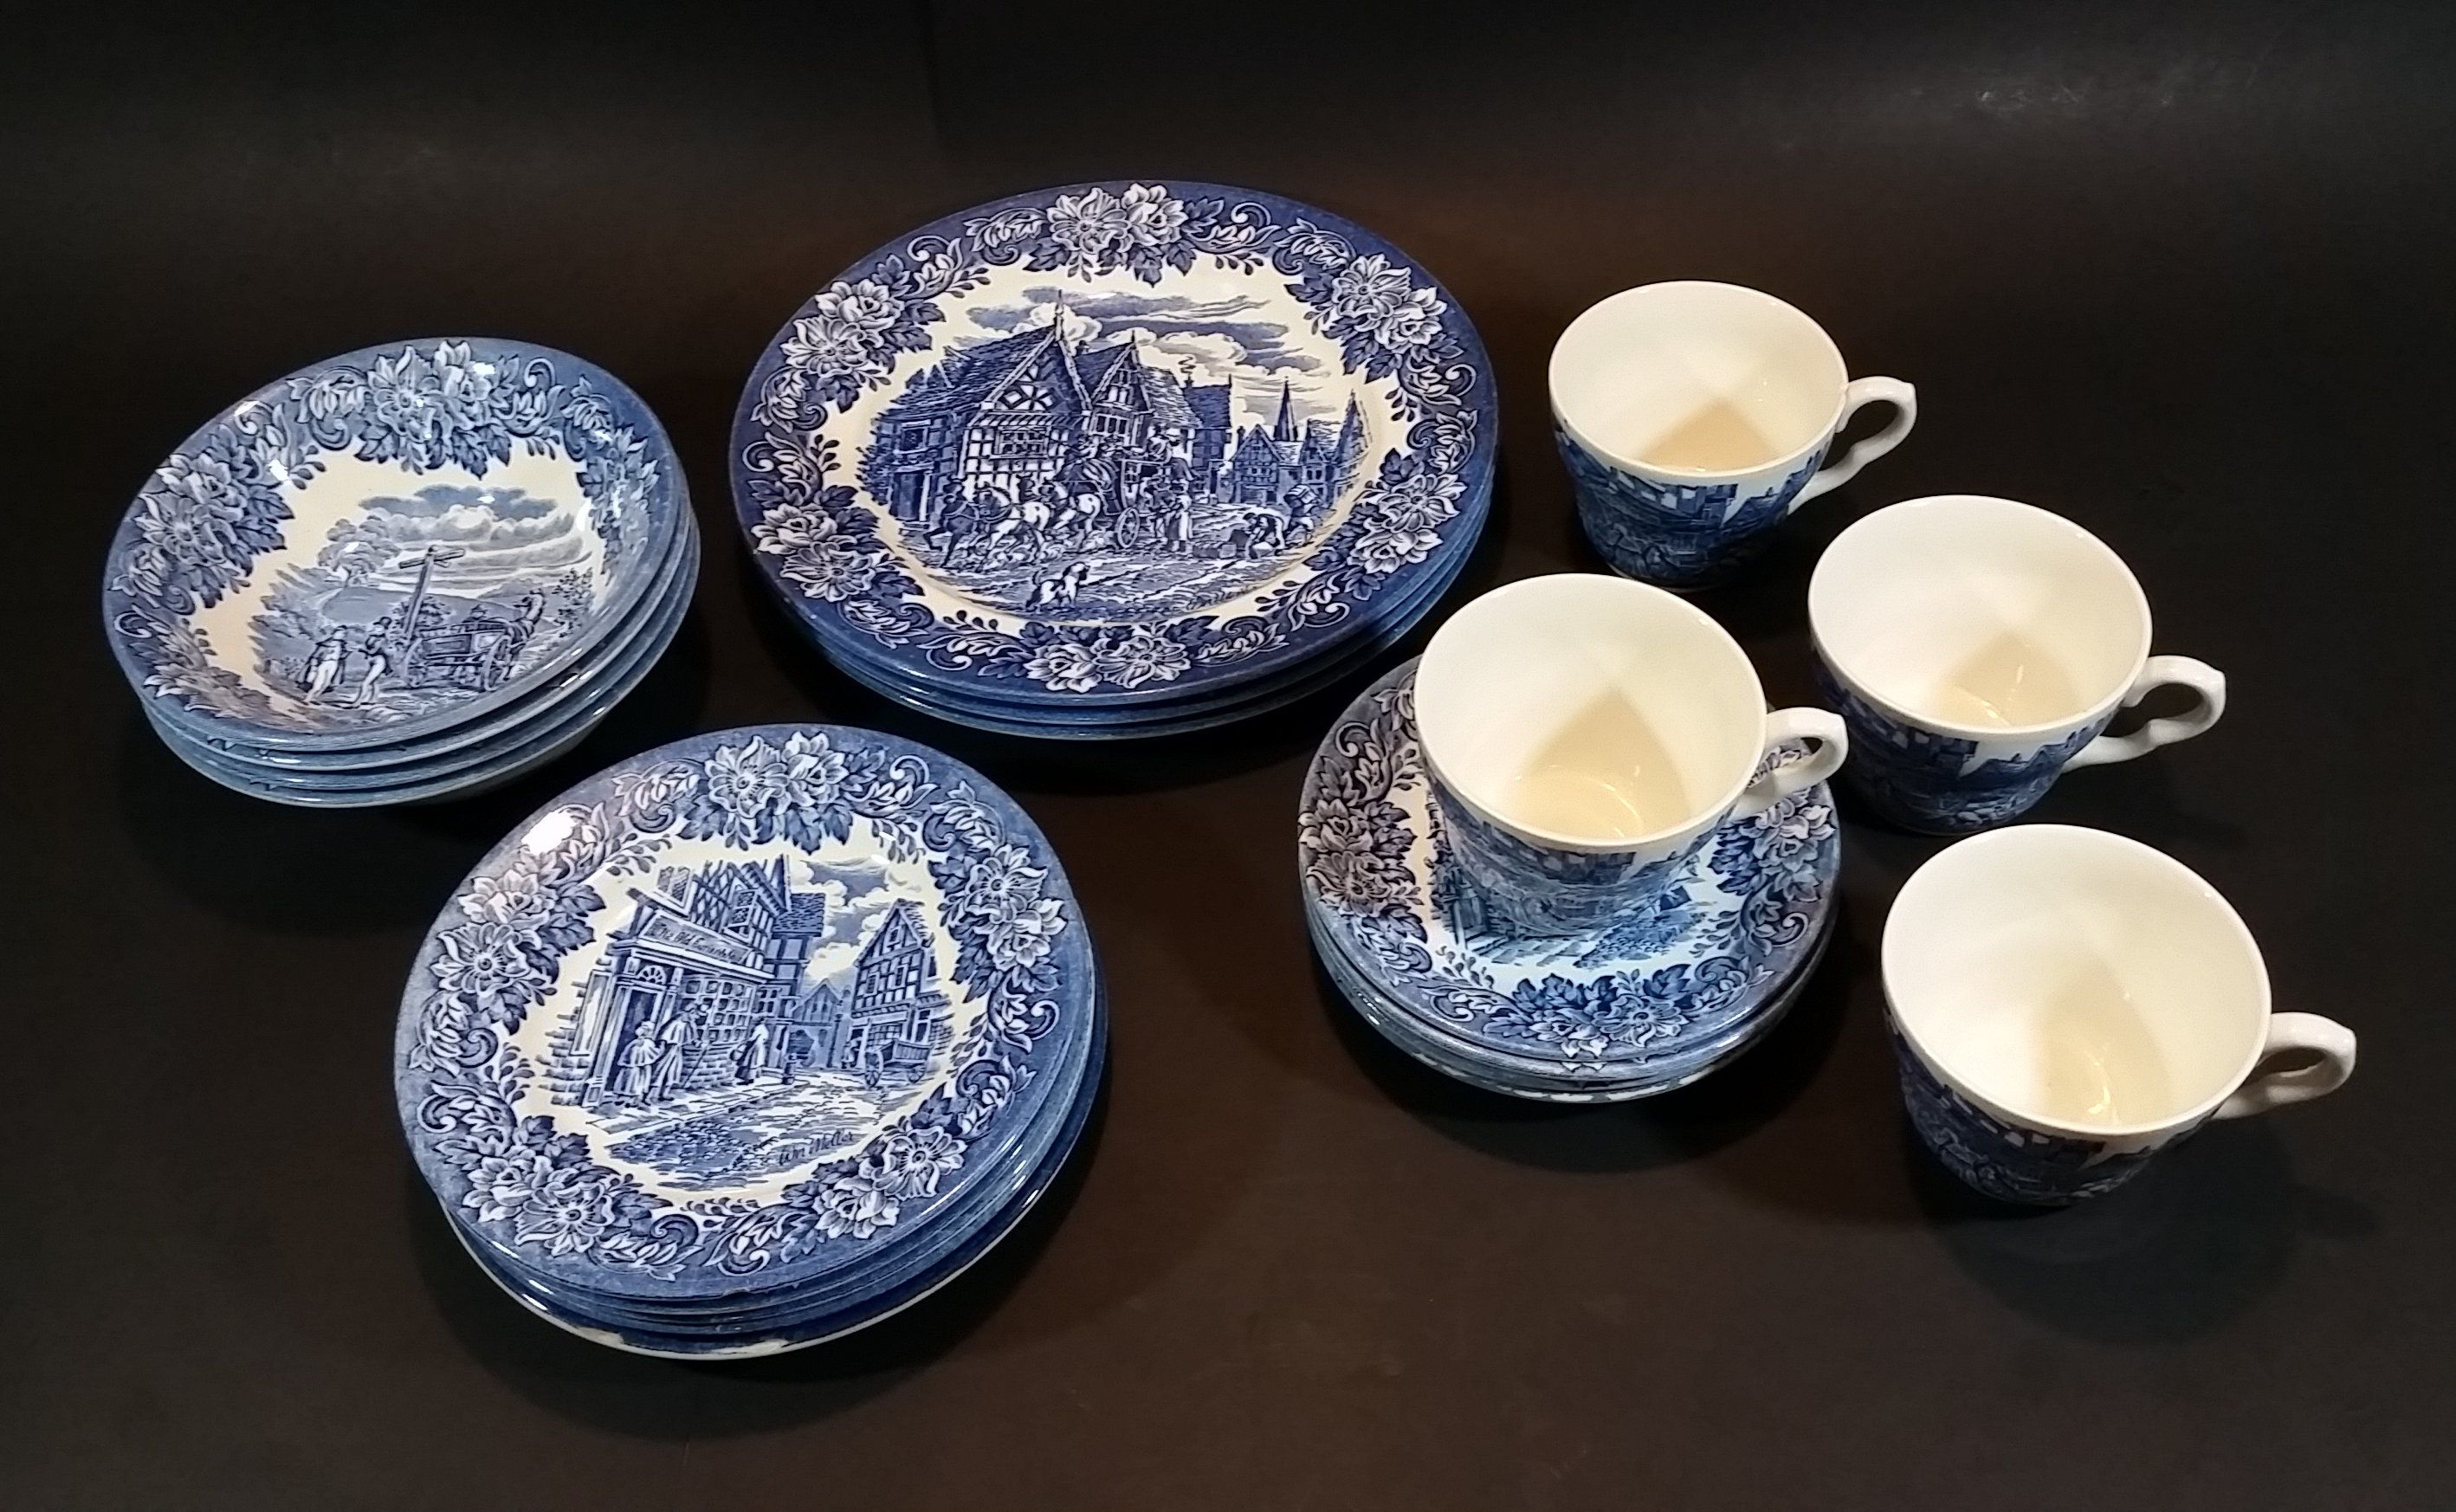 1970-1973 Staffordshire \ English Ironstone Tableware Limited\  Dickens Blue 20 Piece Dinnerware Set & 1970-1973 Staffordshire \